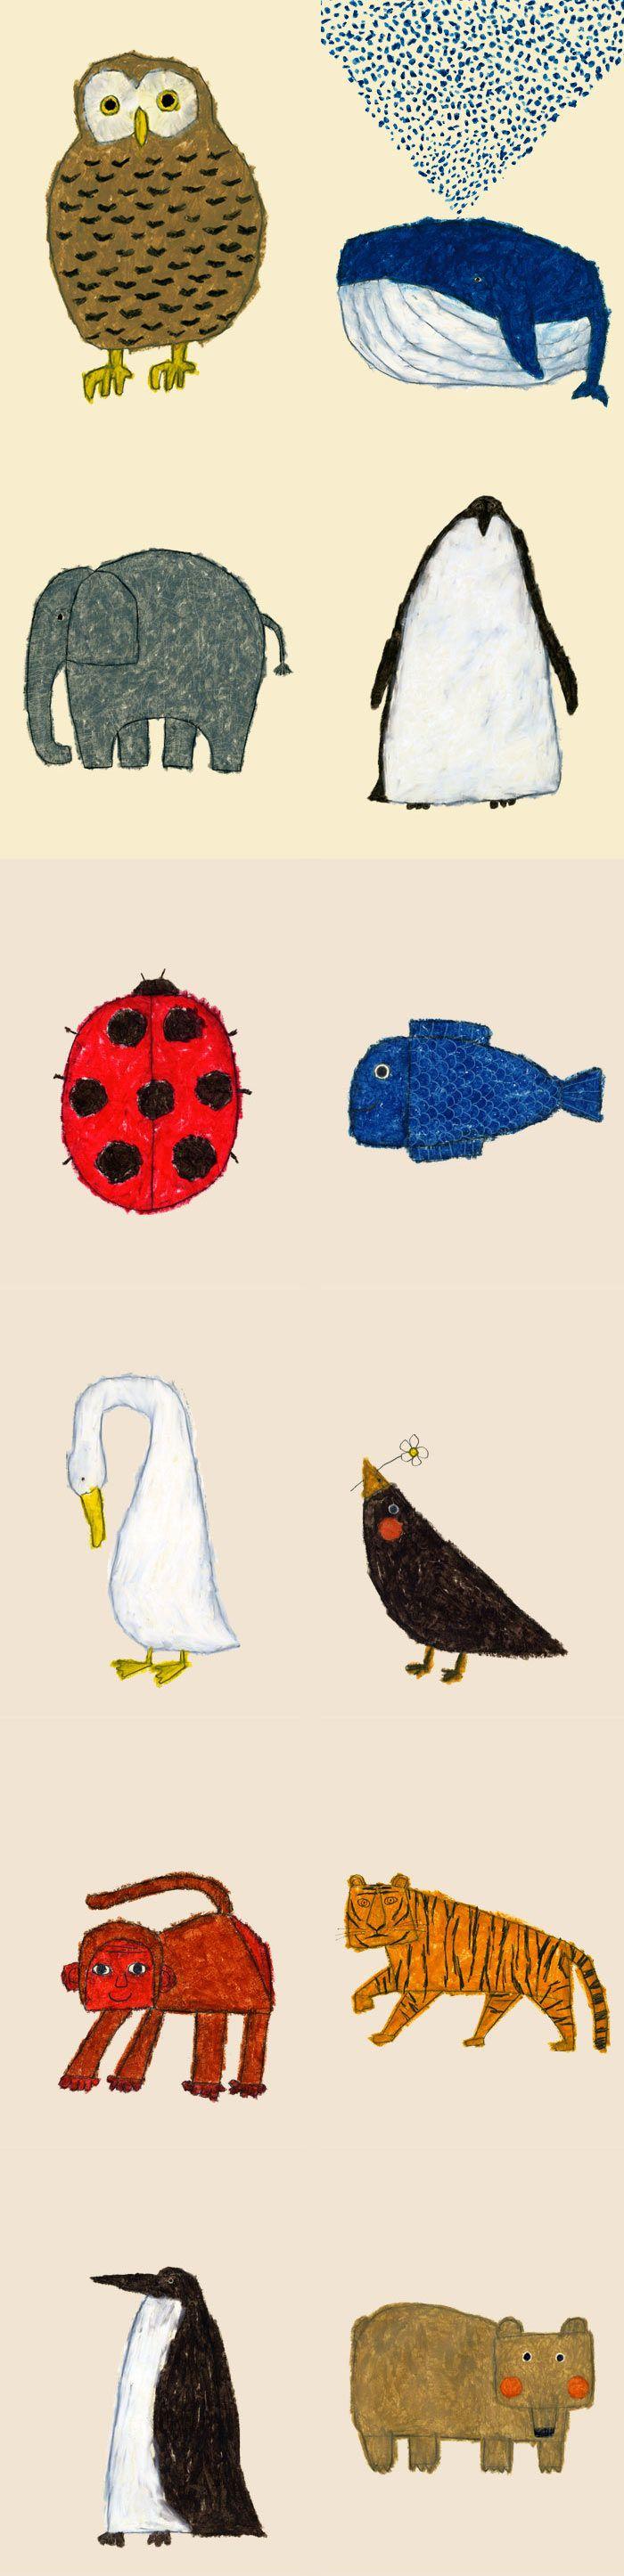 Animal figures by Yusuke Yonezu // kid's illustration